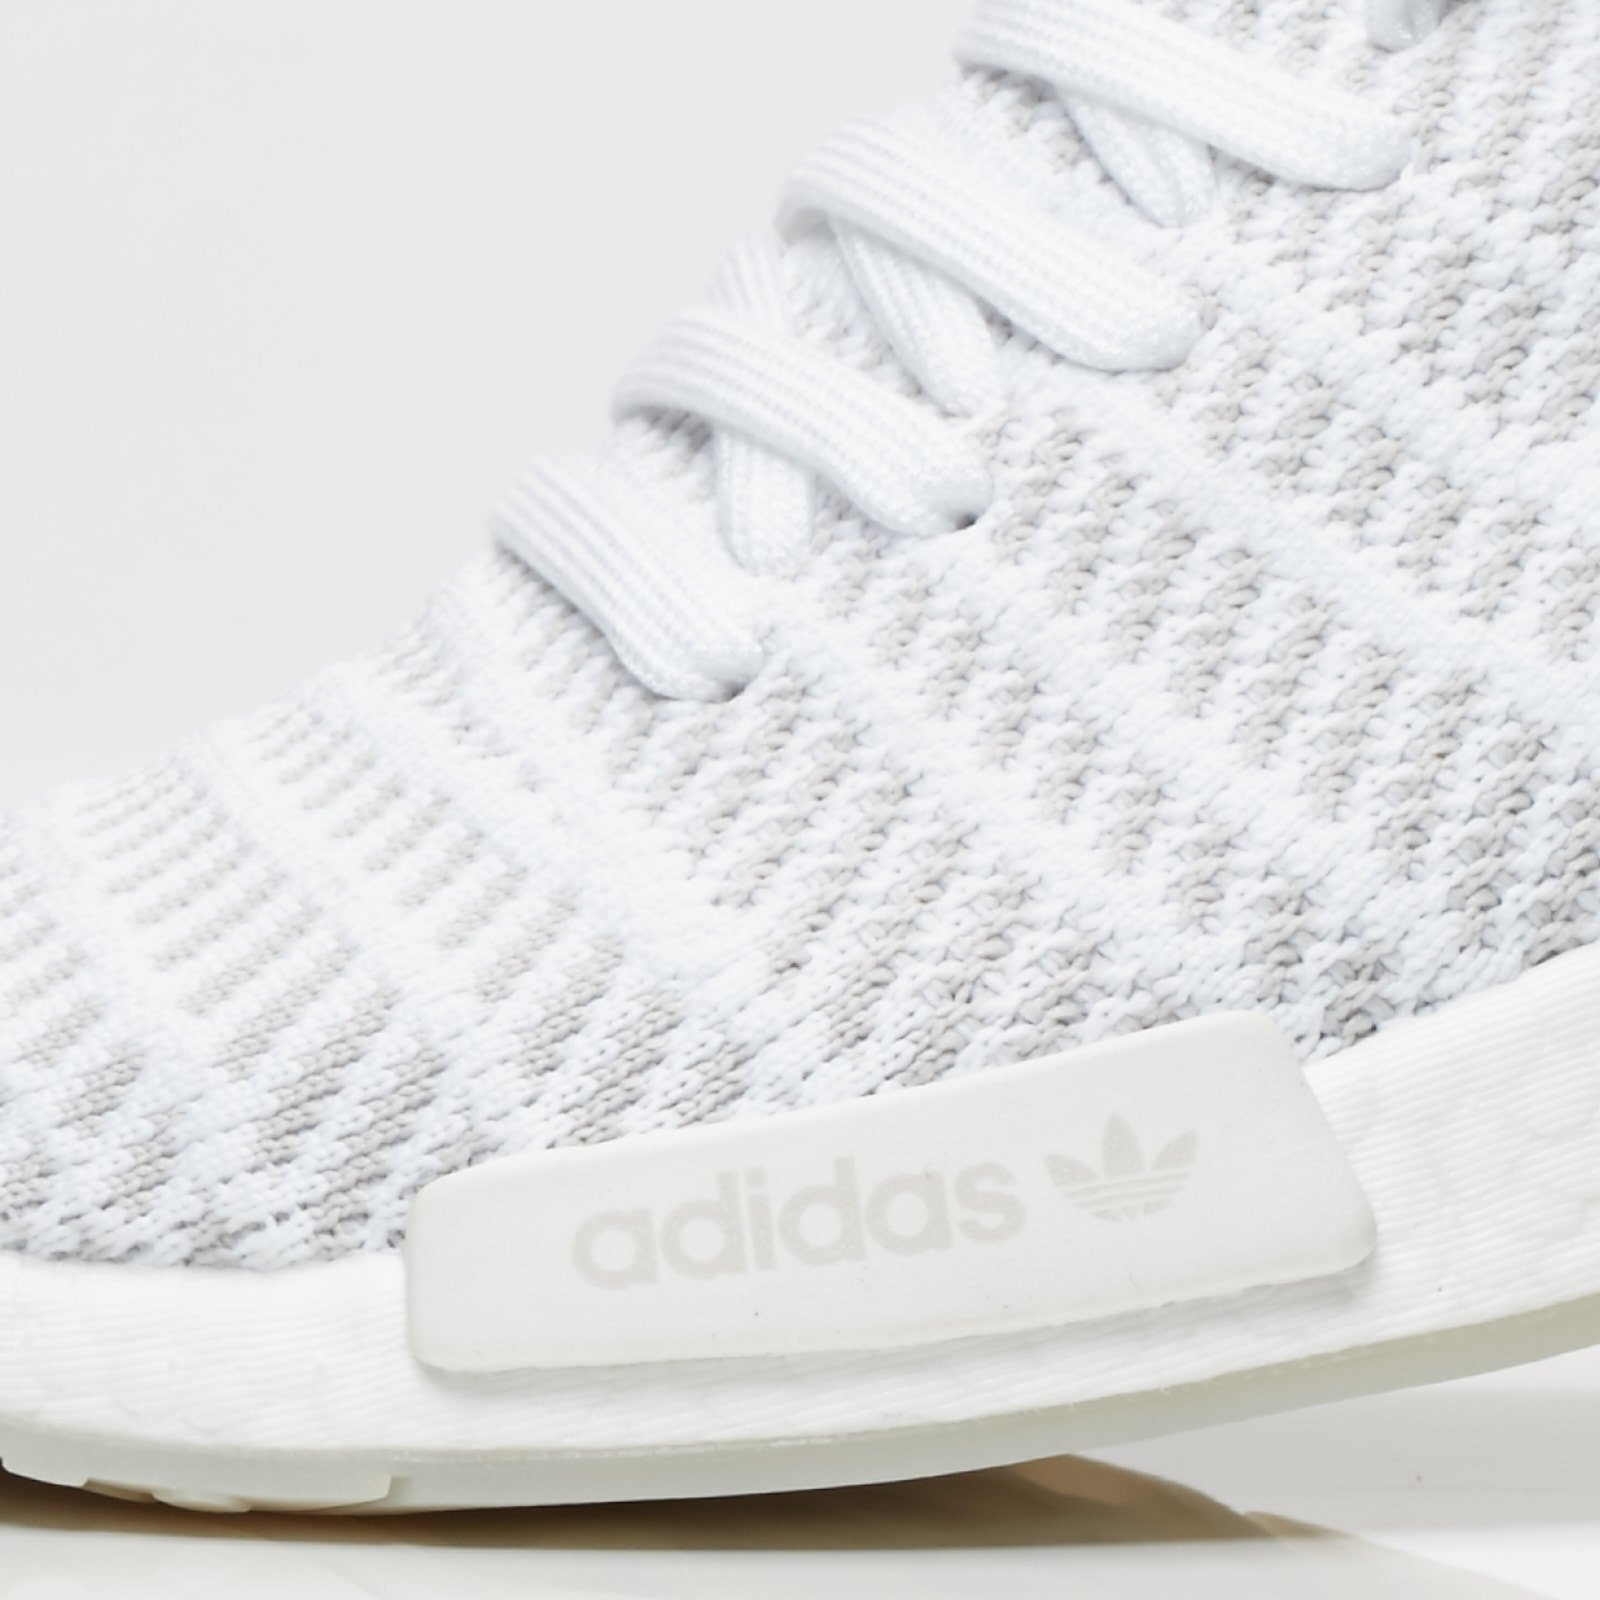 adidas NMD R1 STLT Primeknit Men Shoes White CQ2390